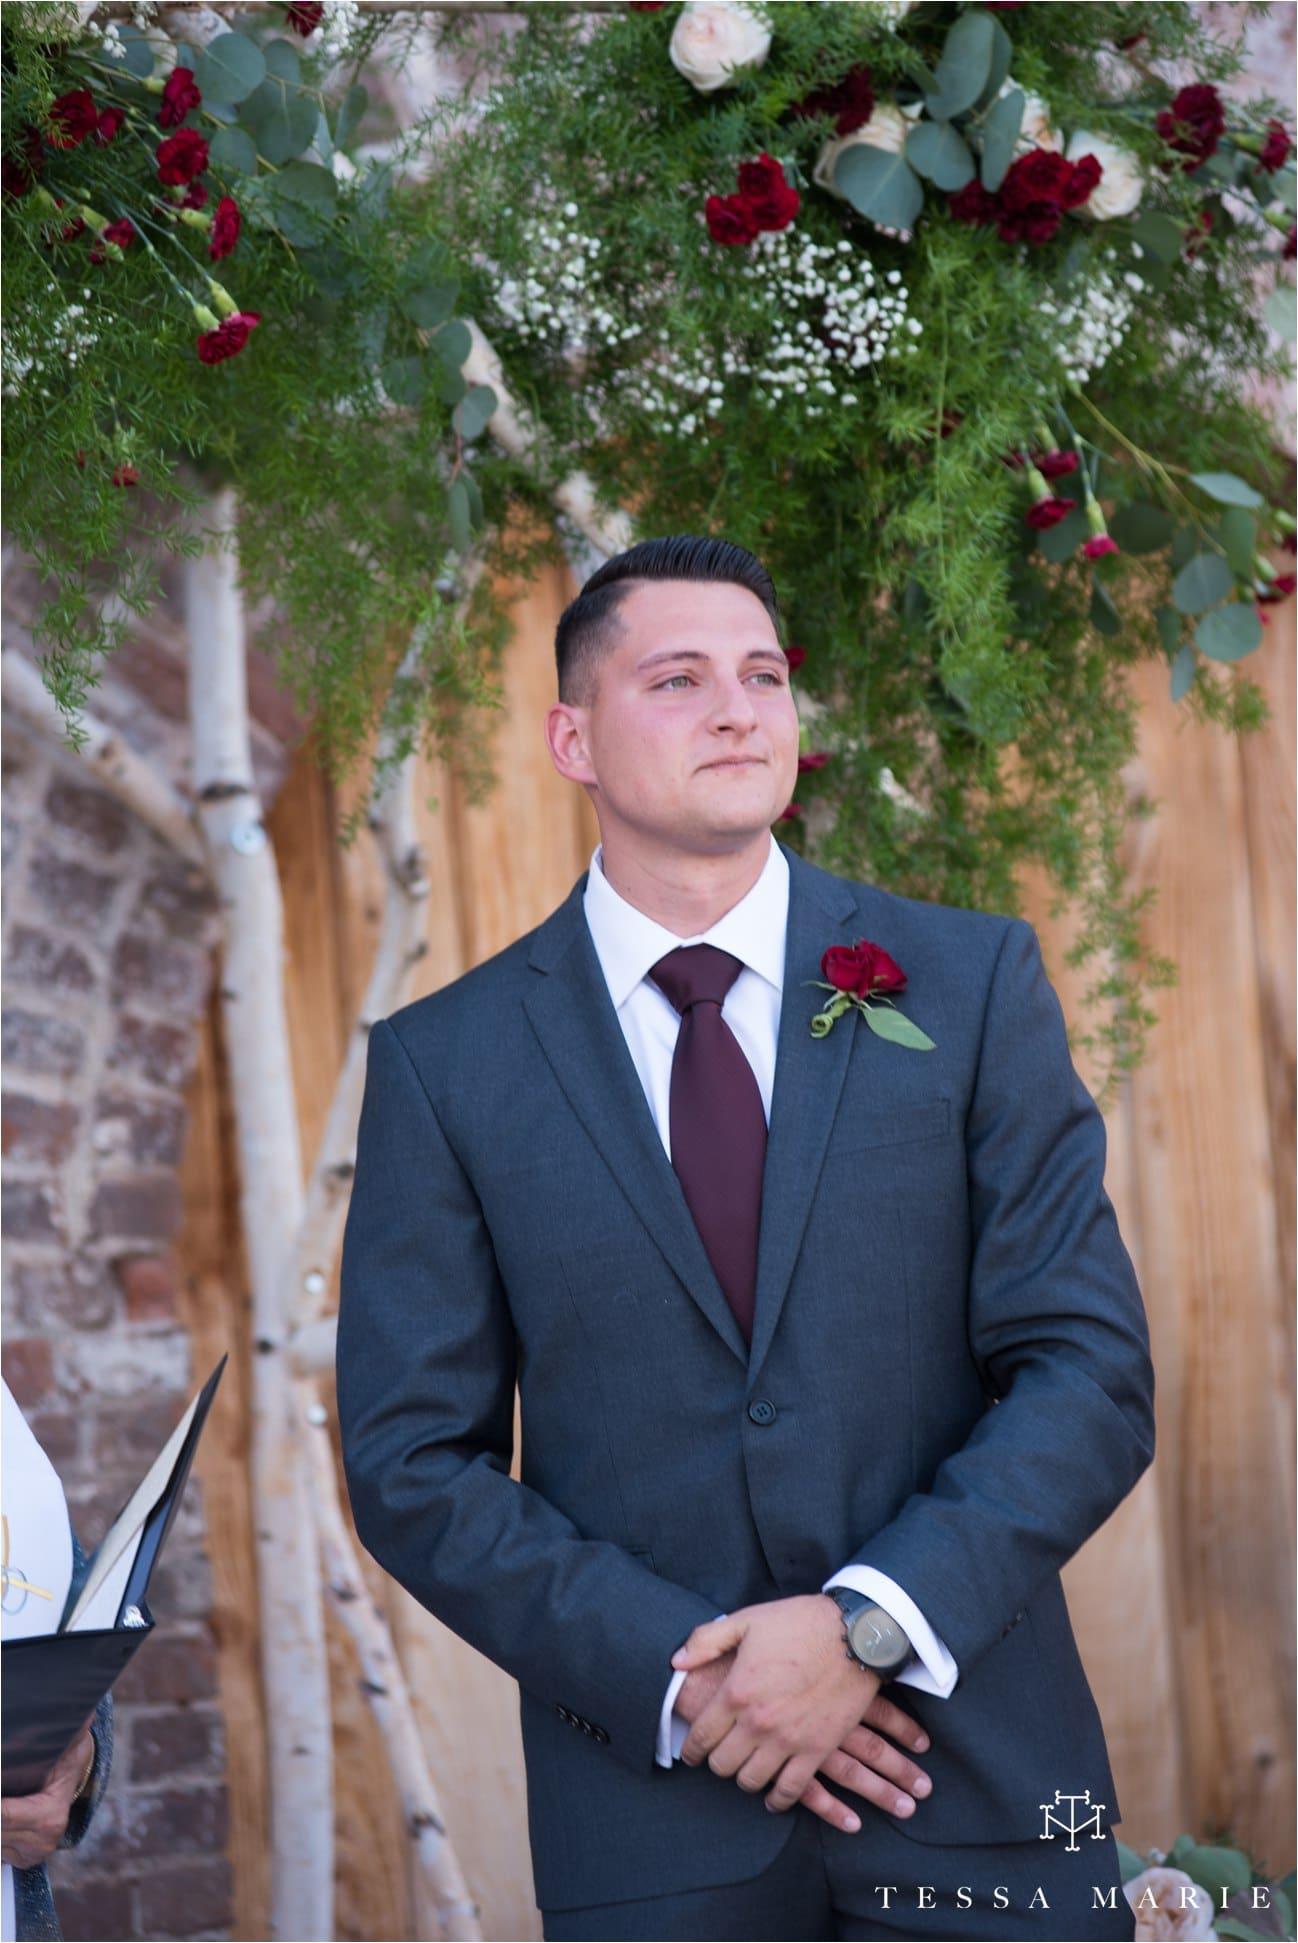 tessa_marie_weddings_rivermill_event_centere_candid_outdoor_wedding_photos_0183